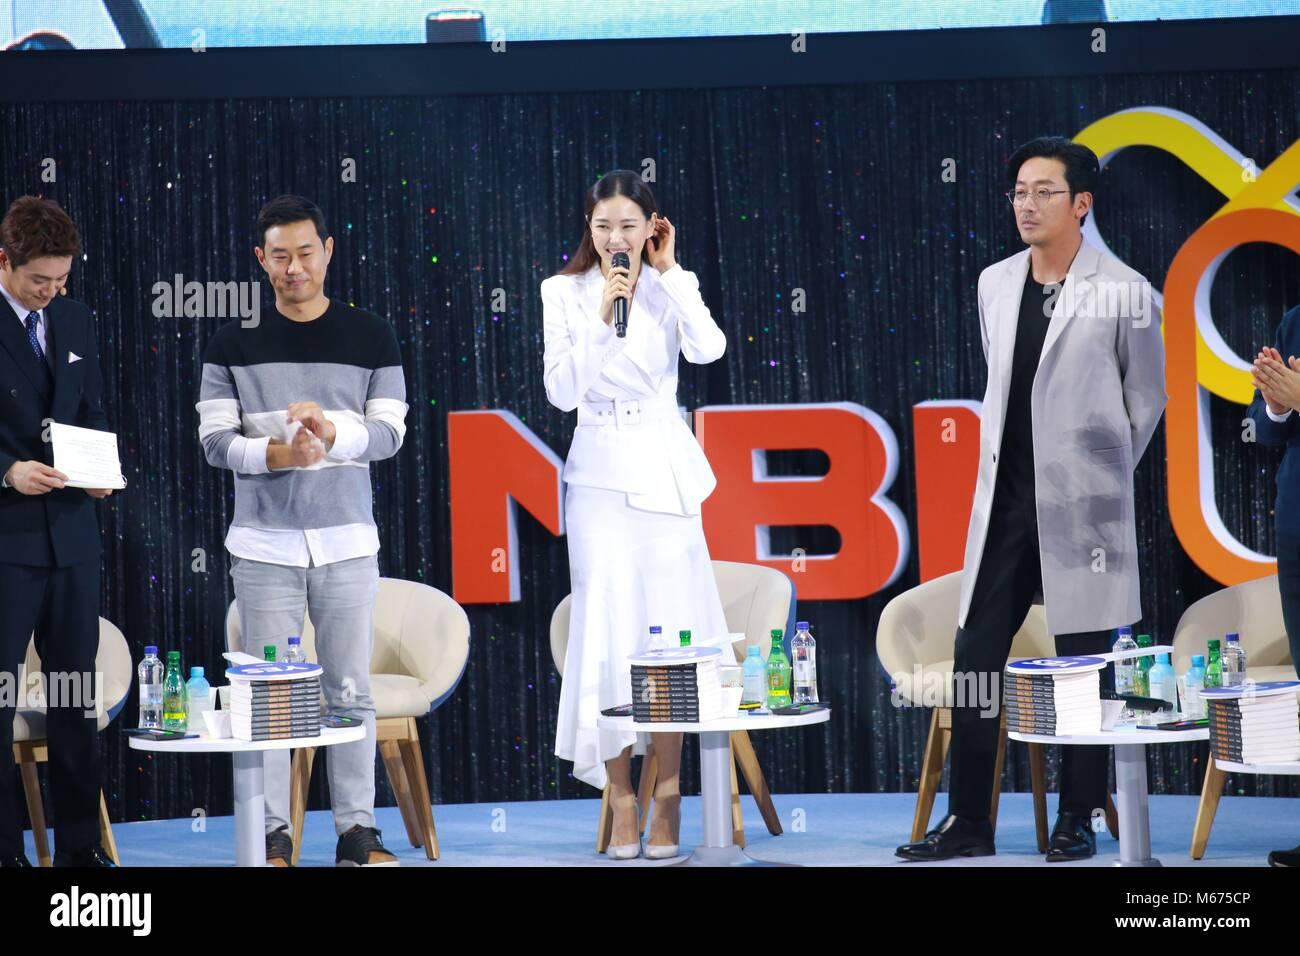 Ji Woon Stock Photos & Ji Woon Stock Images - Alamy